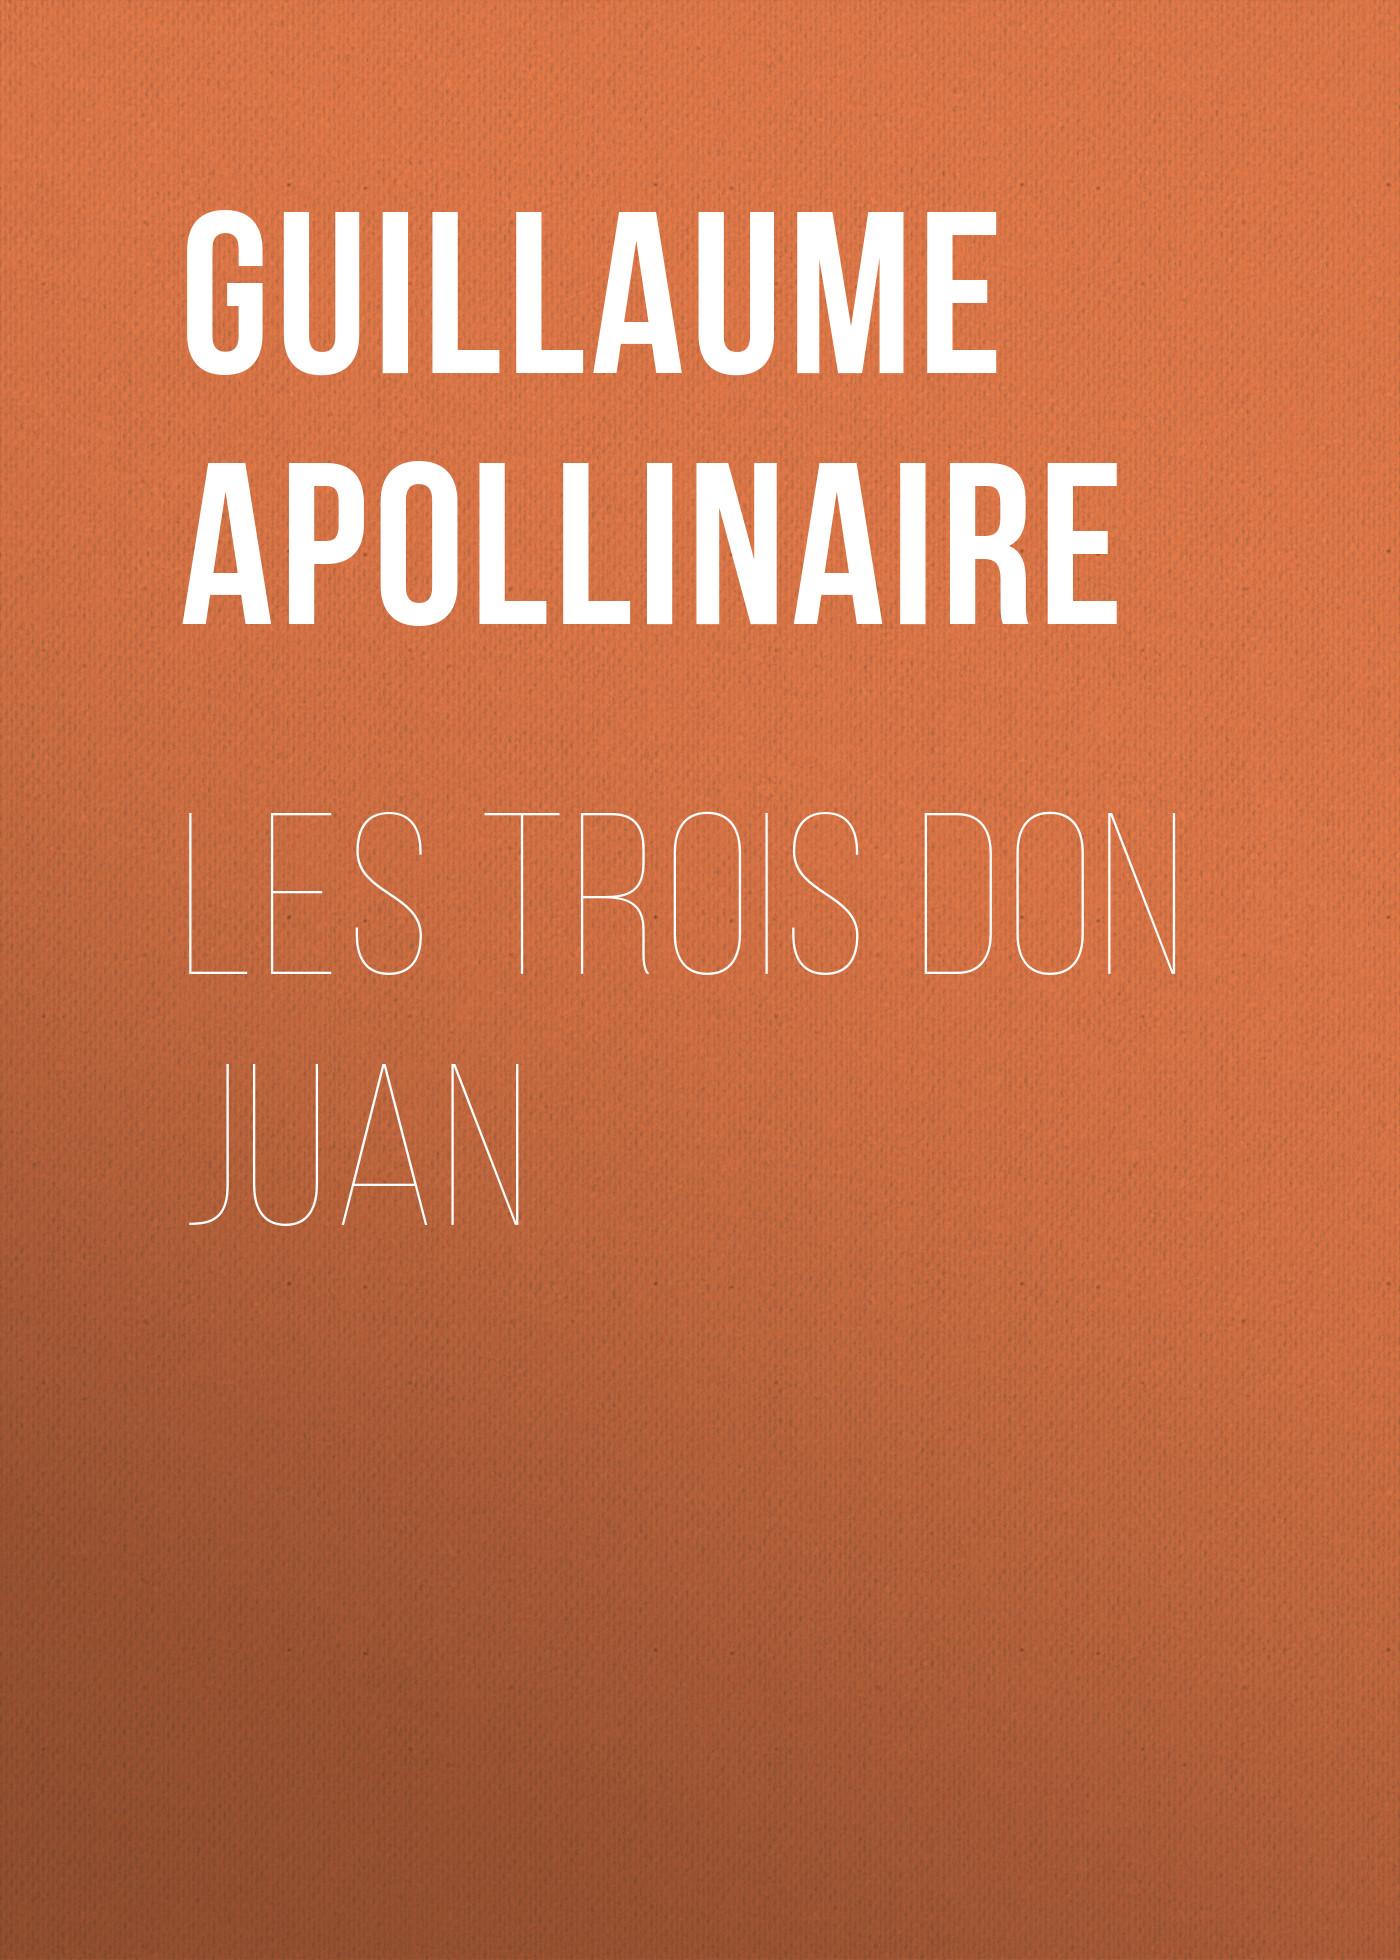 Guillaume Apollinaire Les trois Don Juan adolph schaden der deutsche don juan